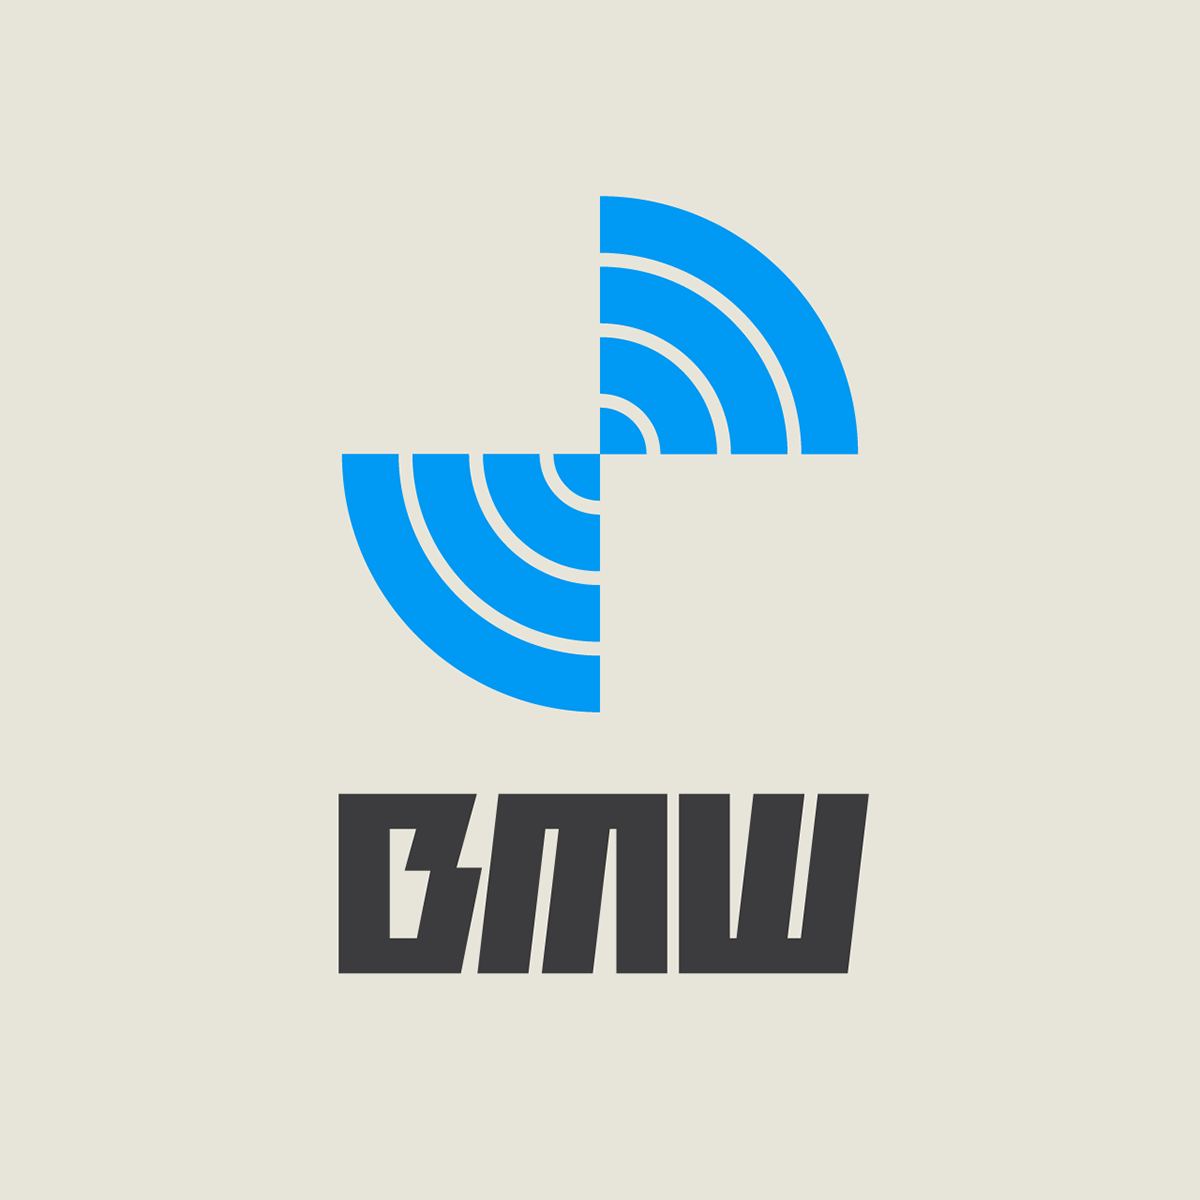 BMW,gold,ikea,japan,kit kat,kodak,Nike,pirelli,spotify,youtube